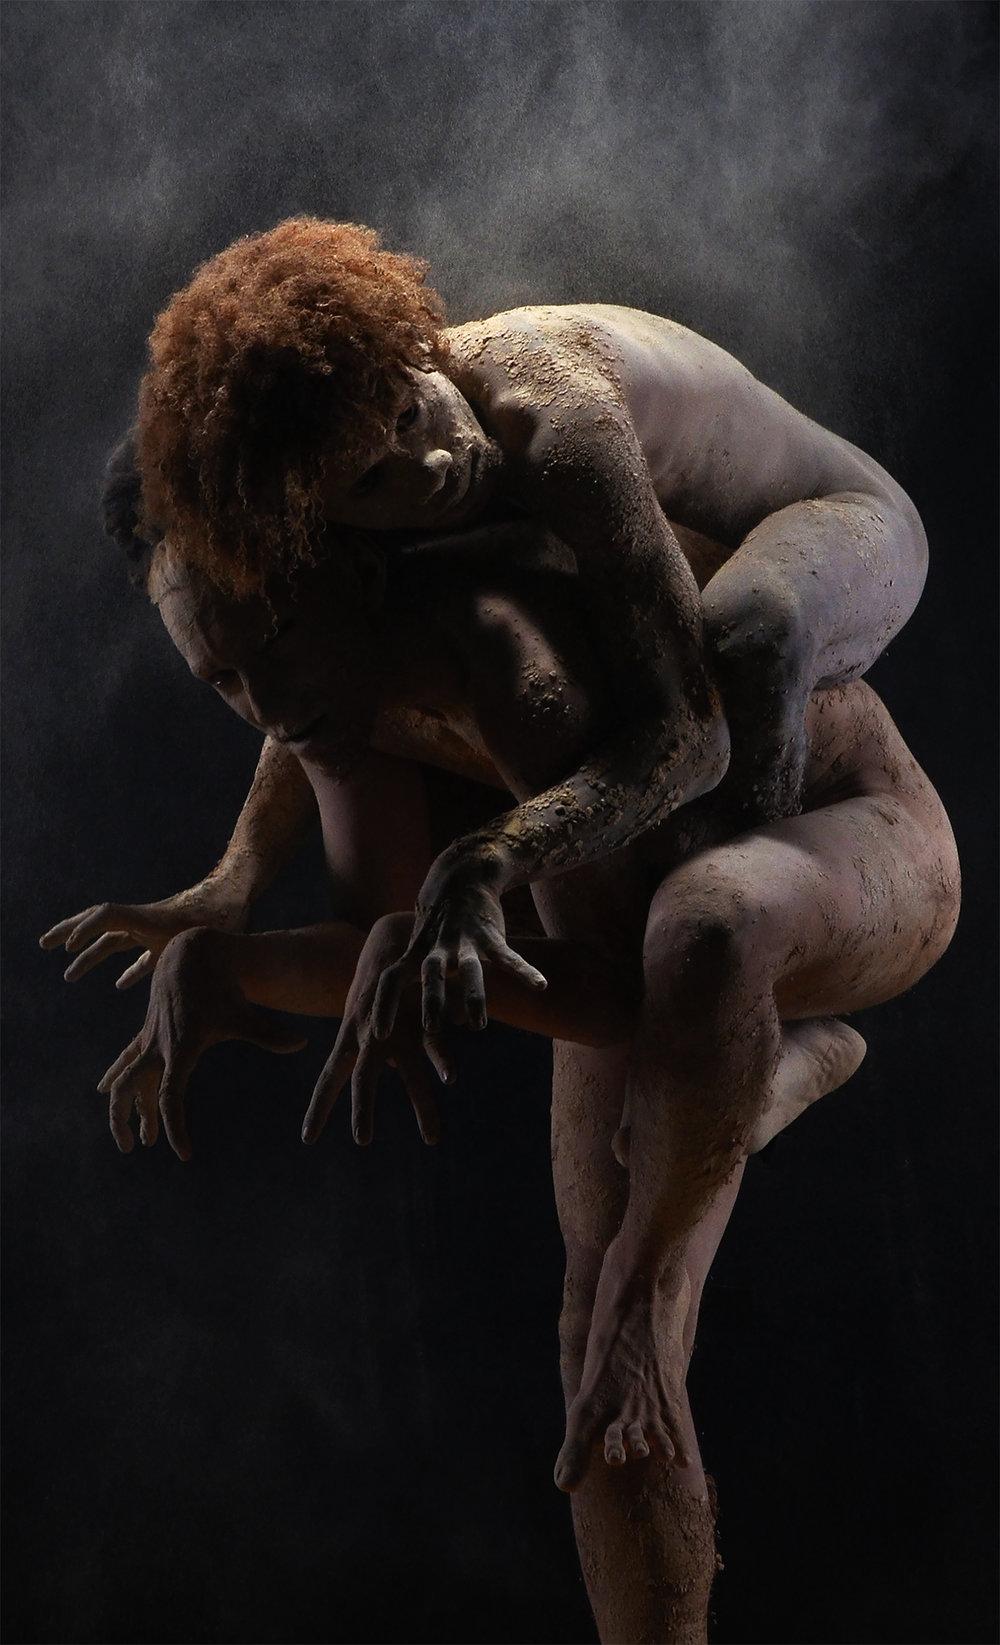 CLAYMOZOME: bodieswithoutboundaries - by Ari Rudenko, models Ari Rudenko and Alfo Smith Kutanggas (West Papua), photography by Gendis Photoworks, Jogjakarta